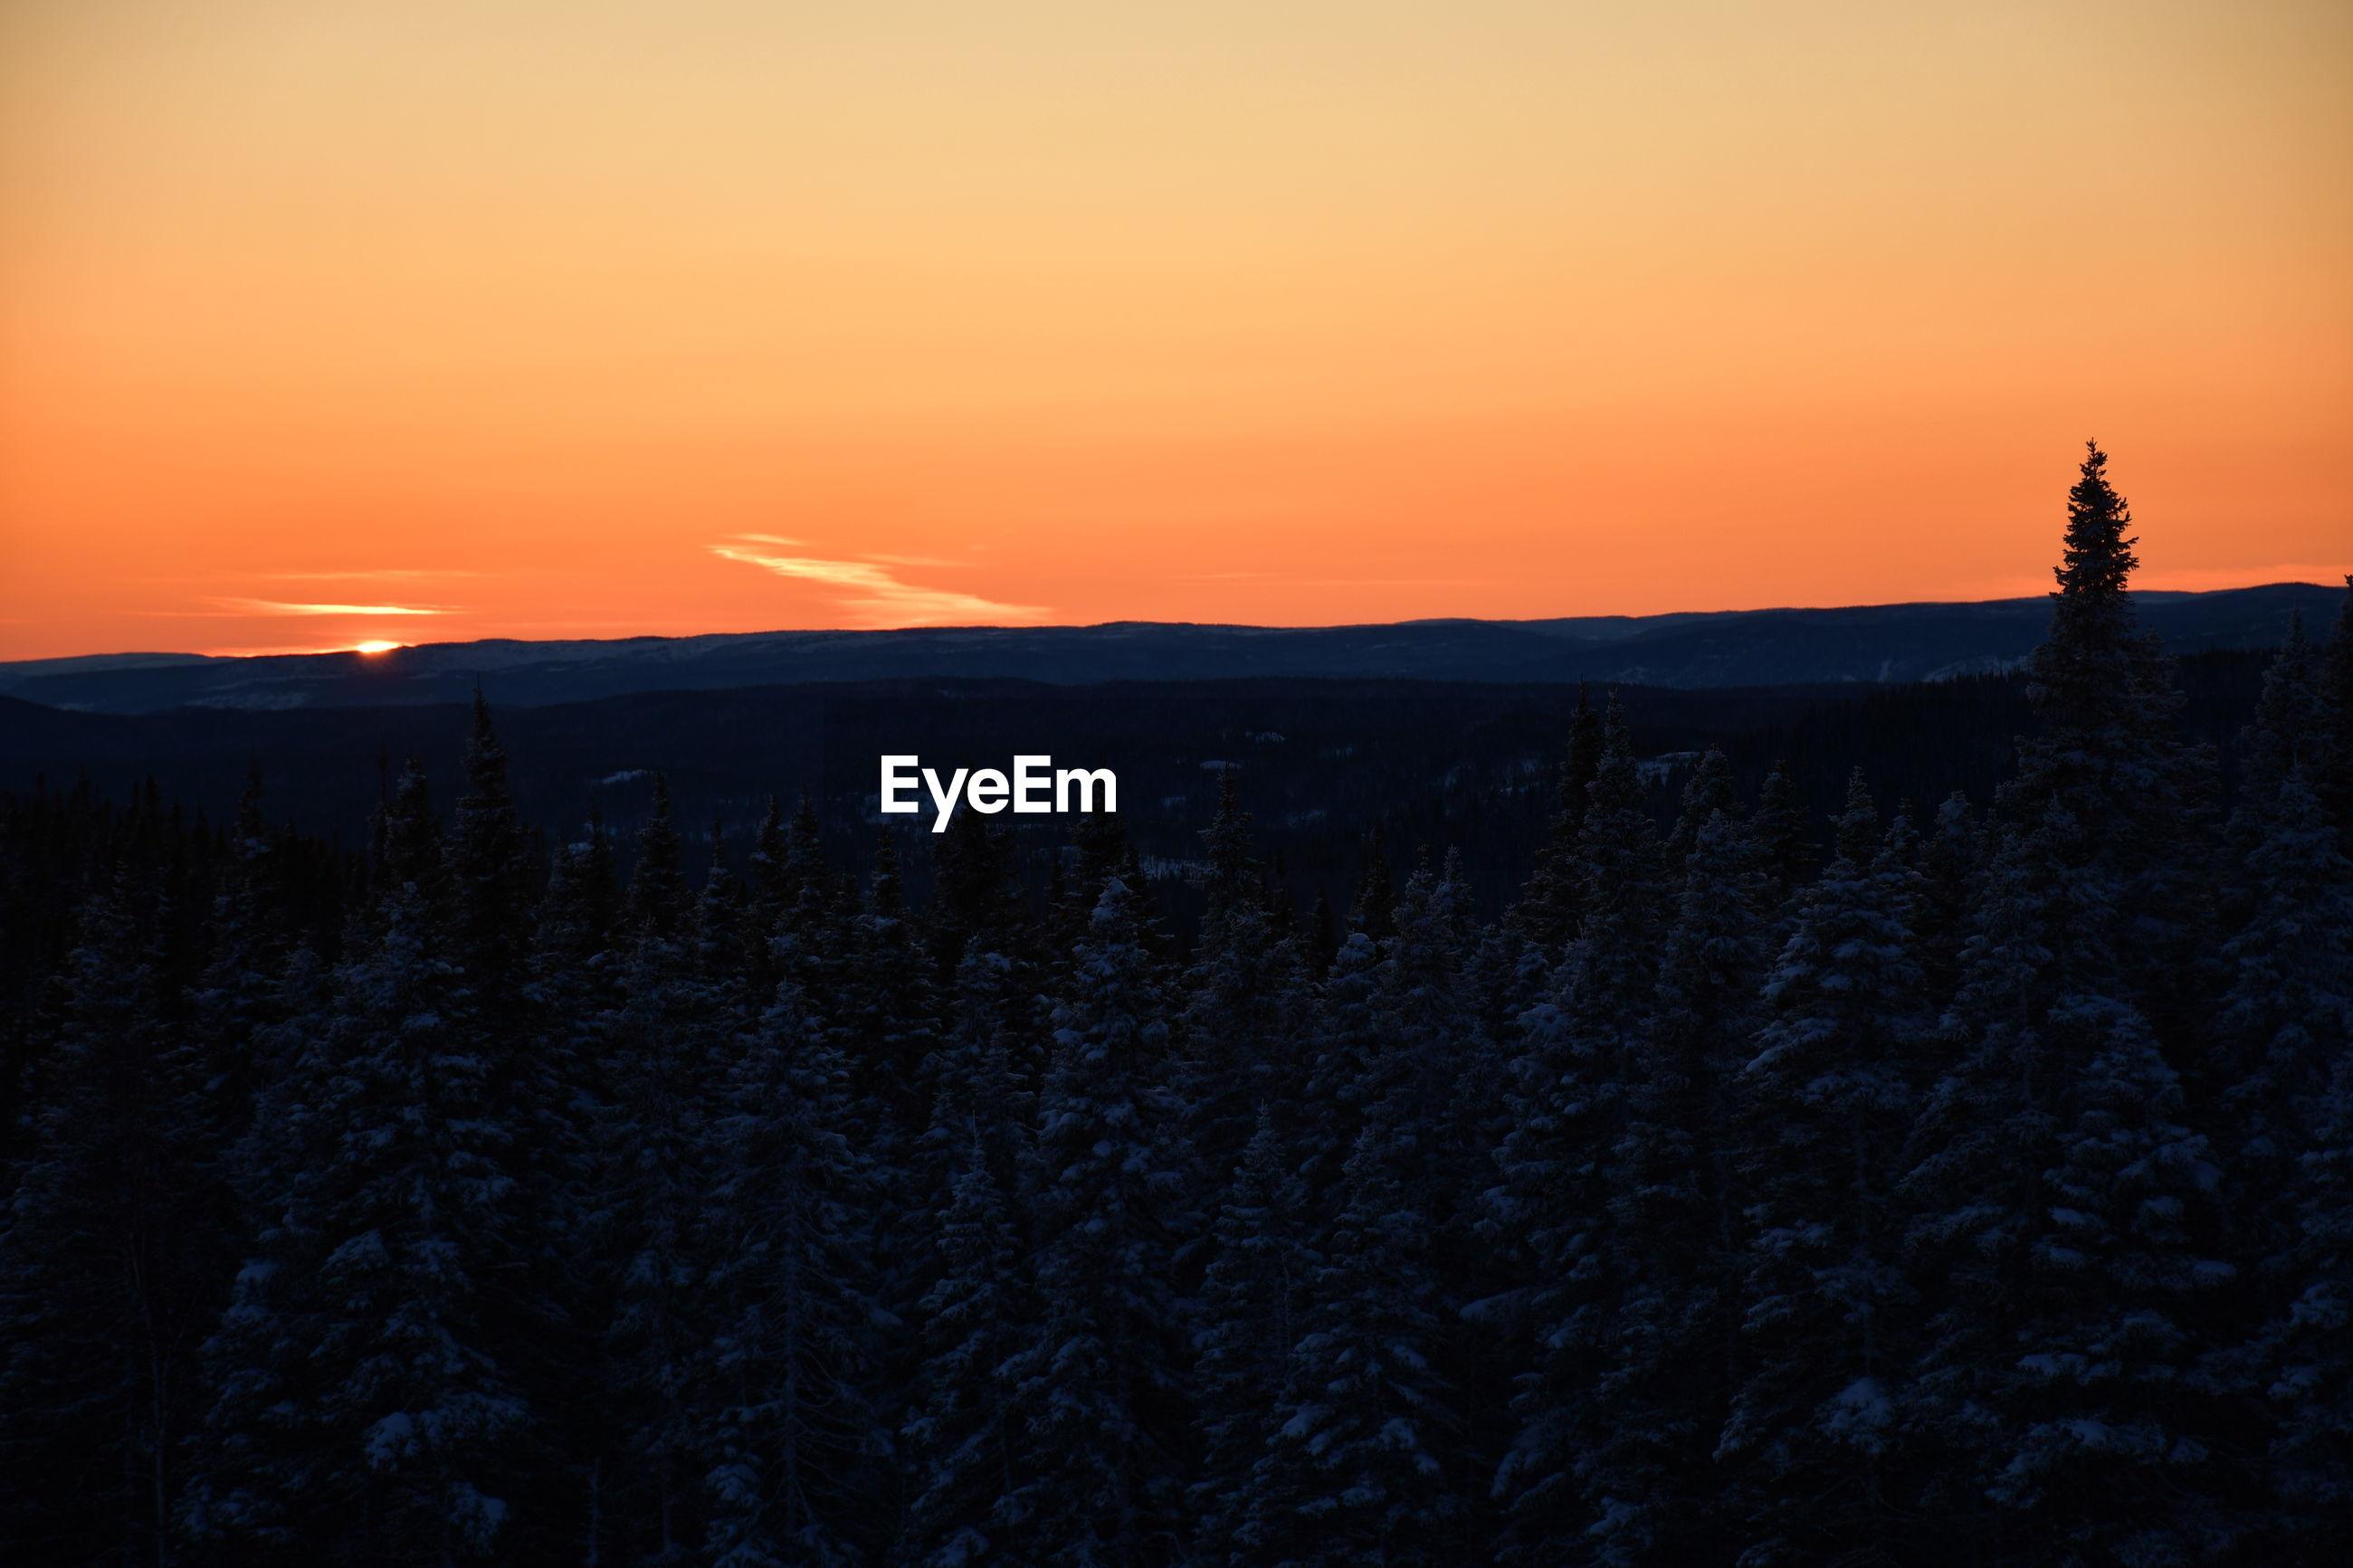 SILHOUETTE LANDSCAPE AGAINST ROMANTIC SKY AT SUNSET